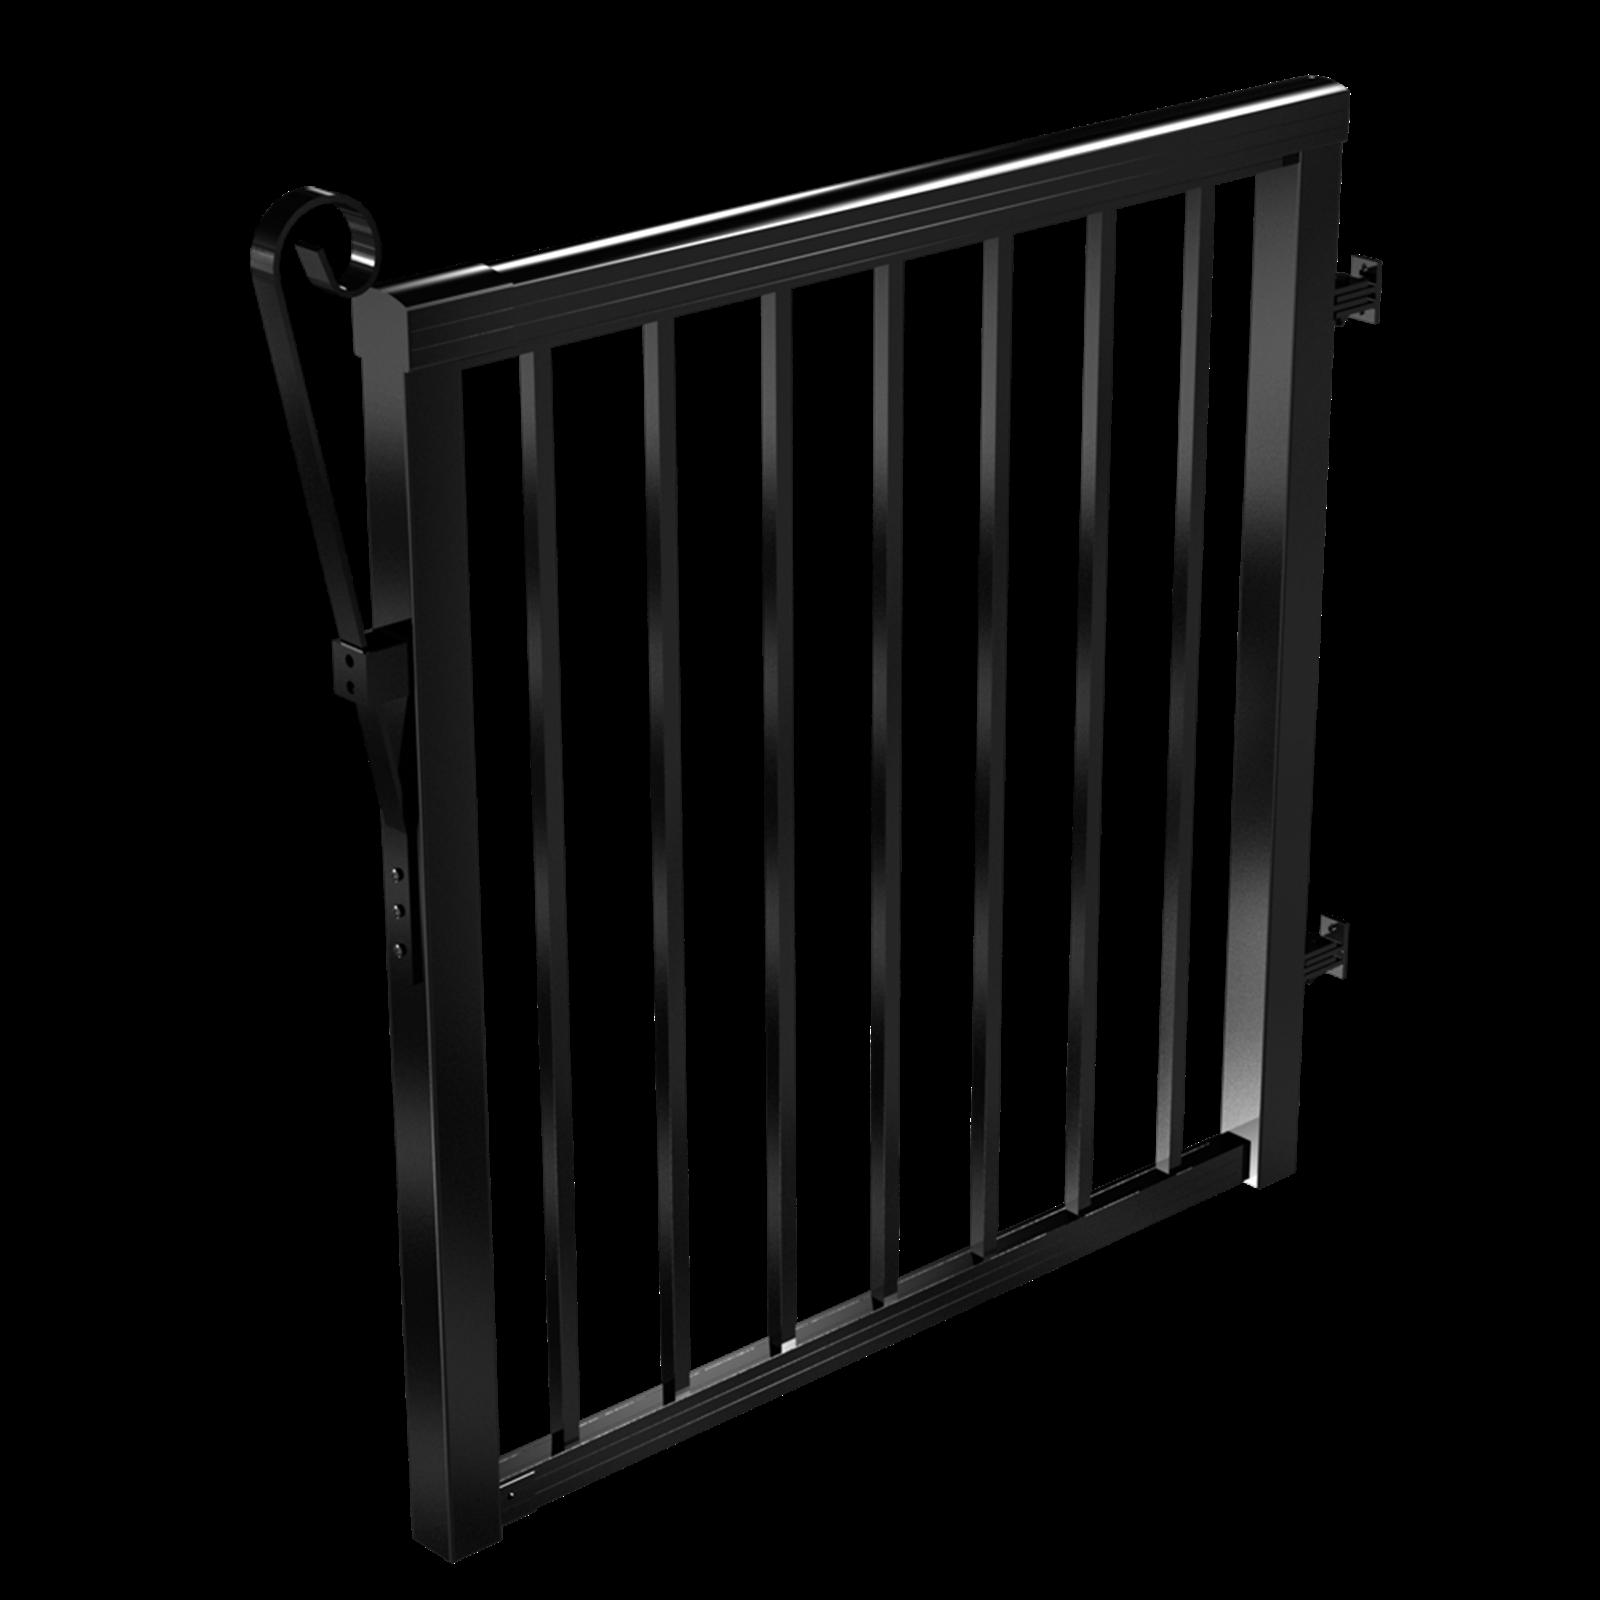 Peak Products 1000mm Black Aluminium Balustrade Standard Baluster Gate Kit